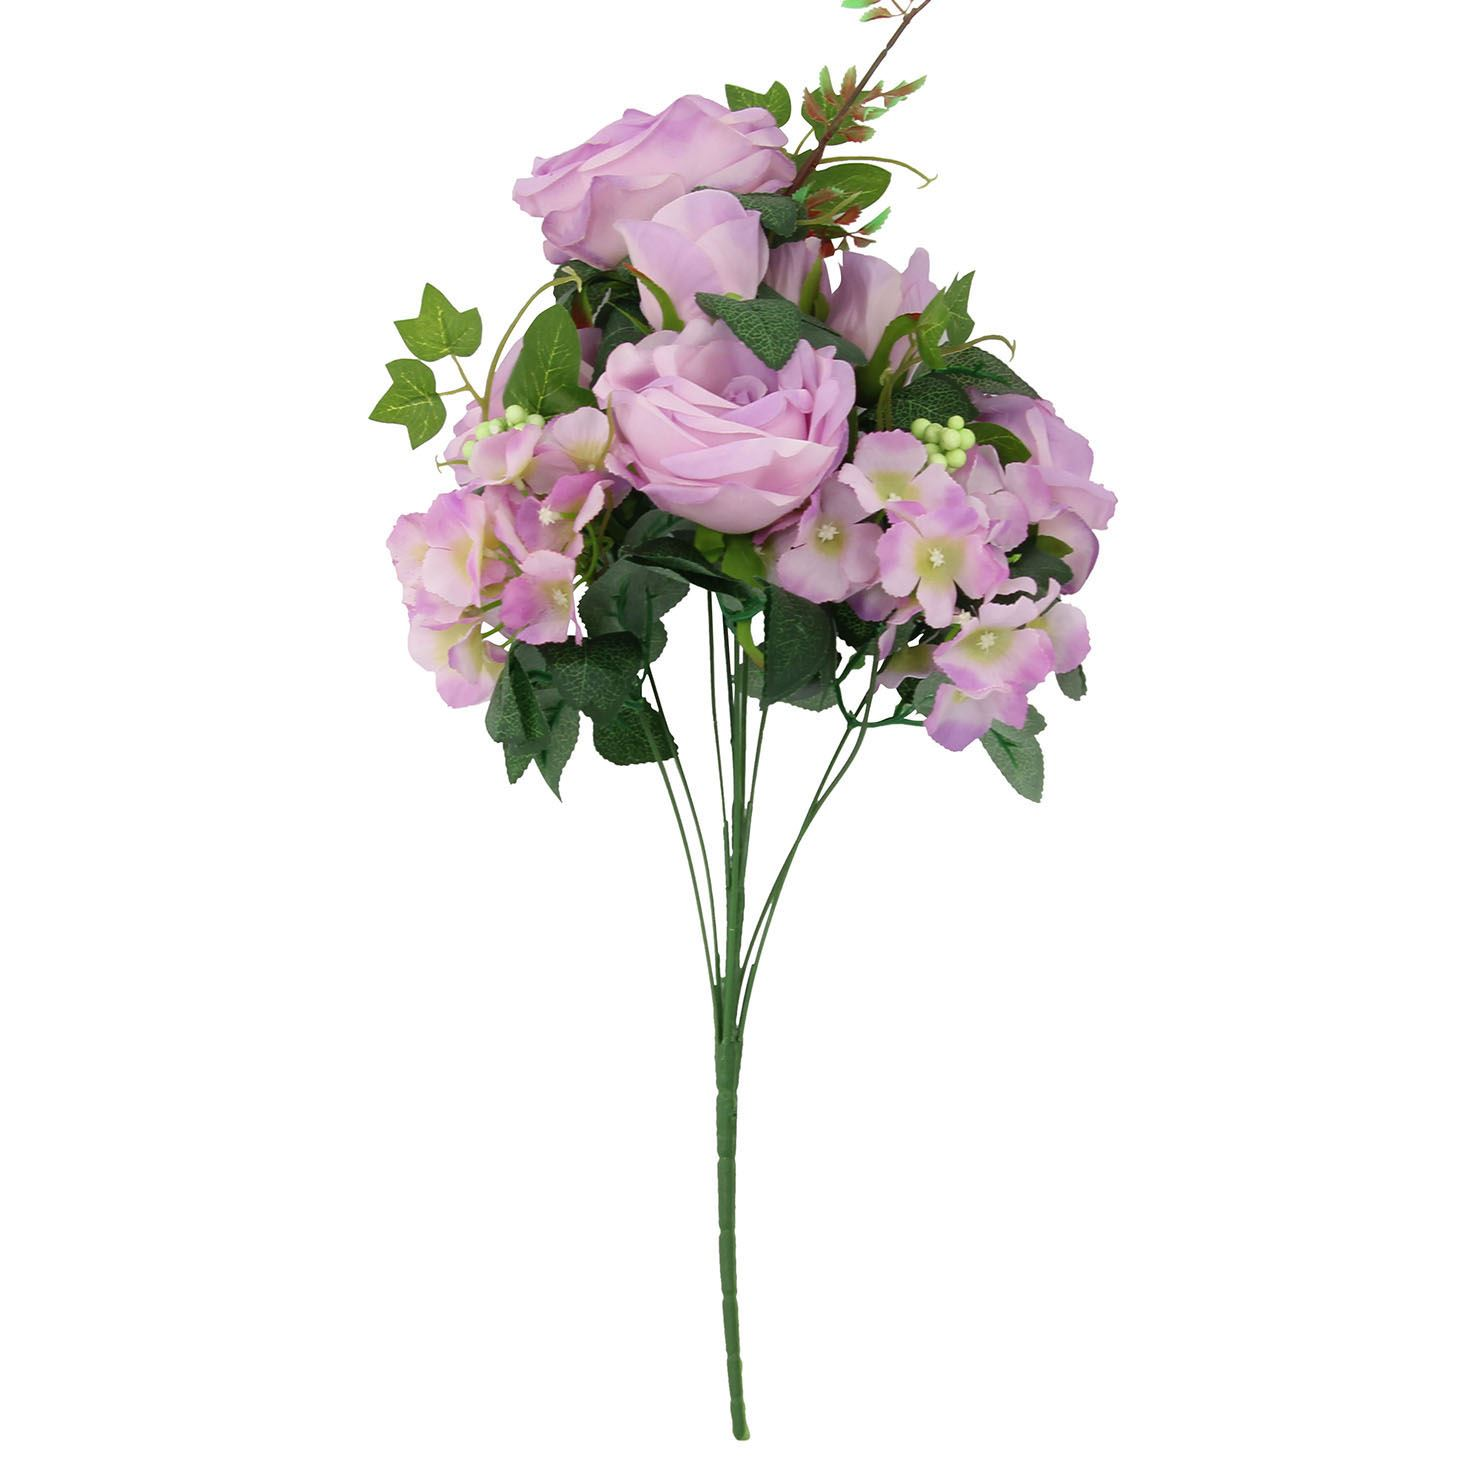 Xl 9 Head Rose And Hydrangea Bouquet Artificial Silk Fake Flowers